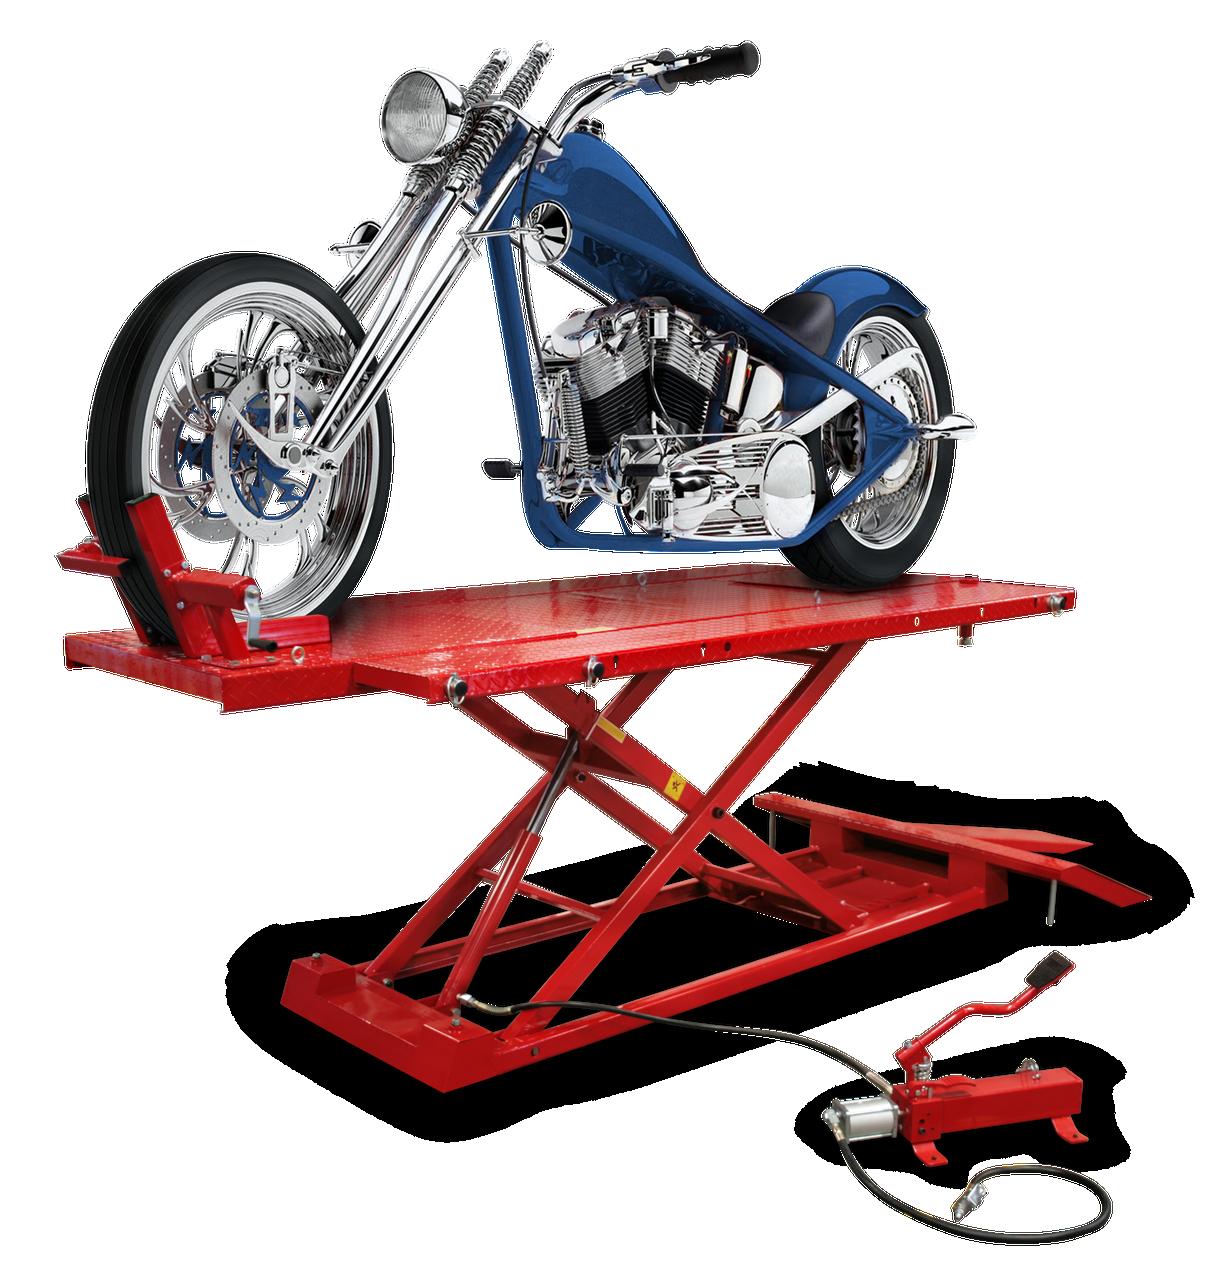 Motorcycle / ATV Jack